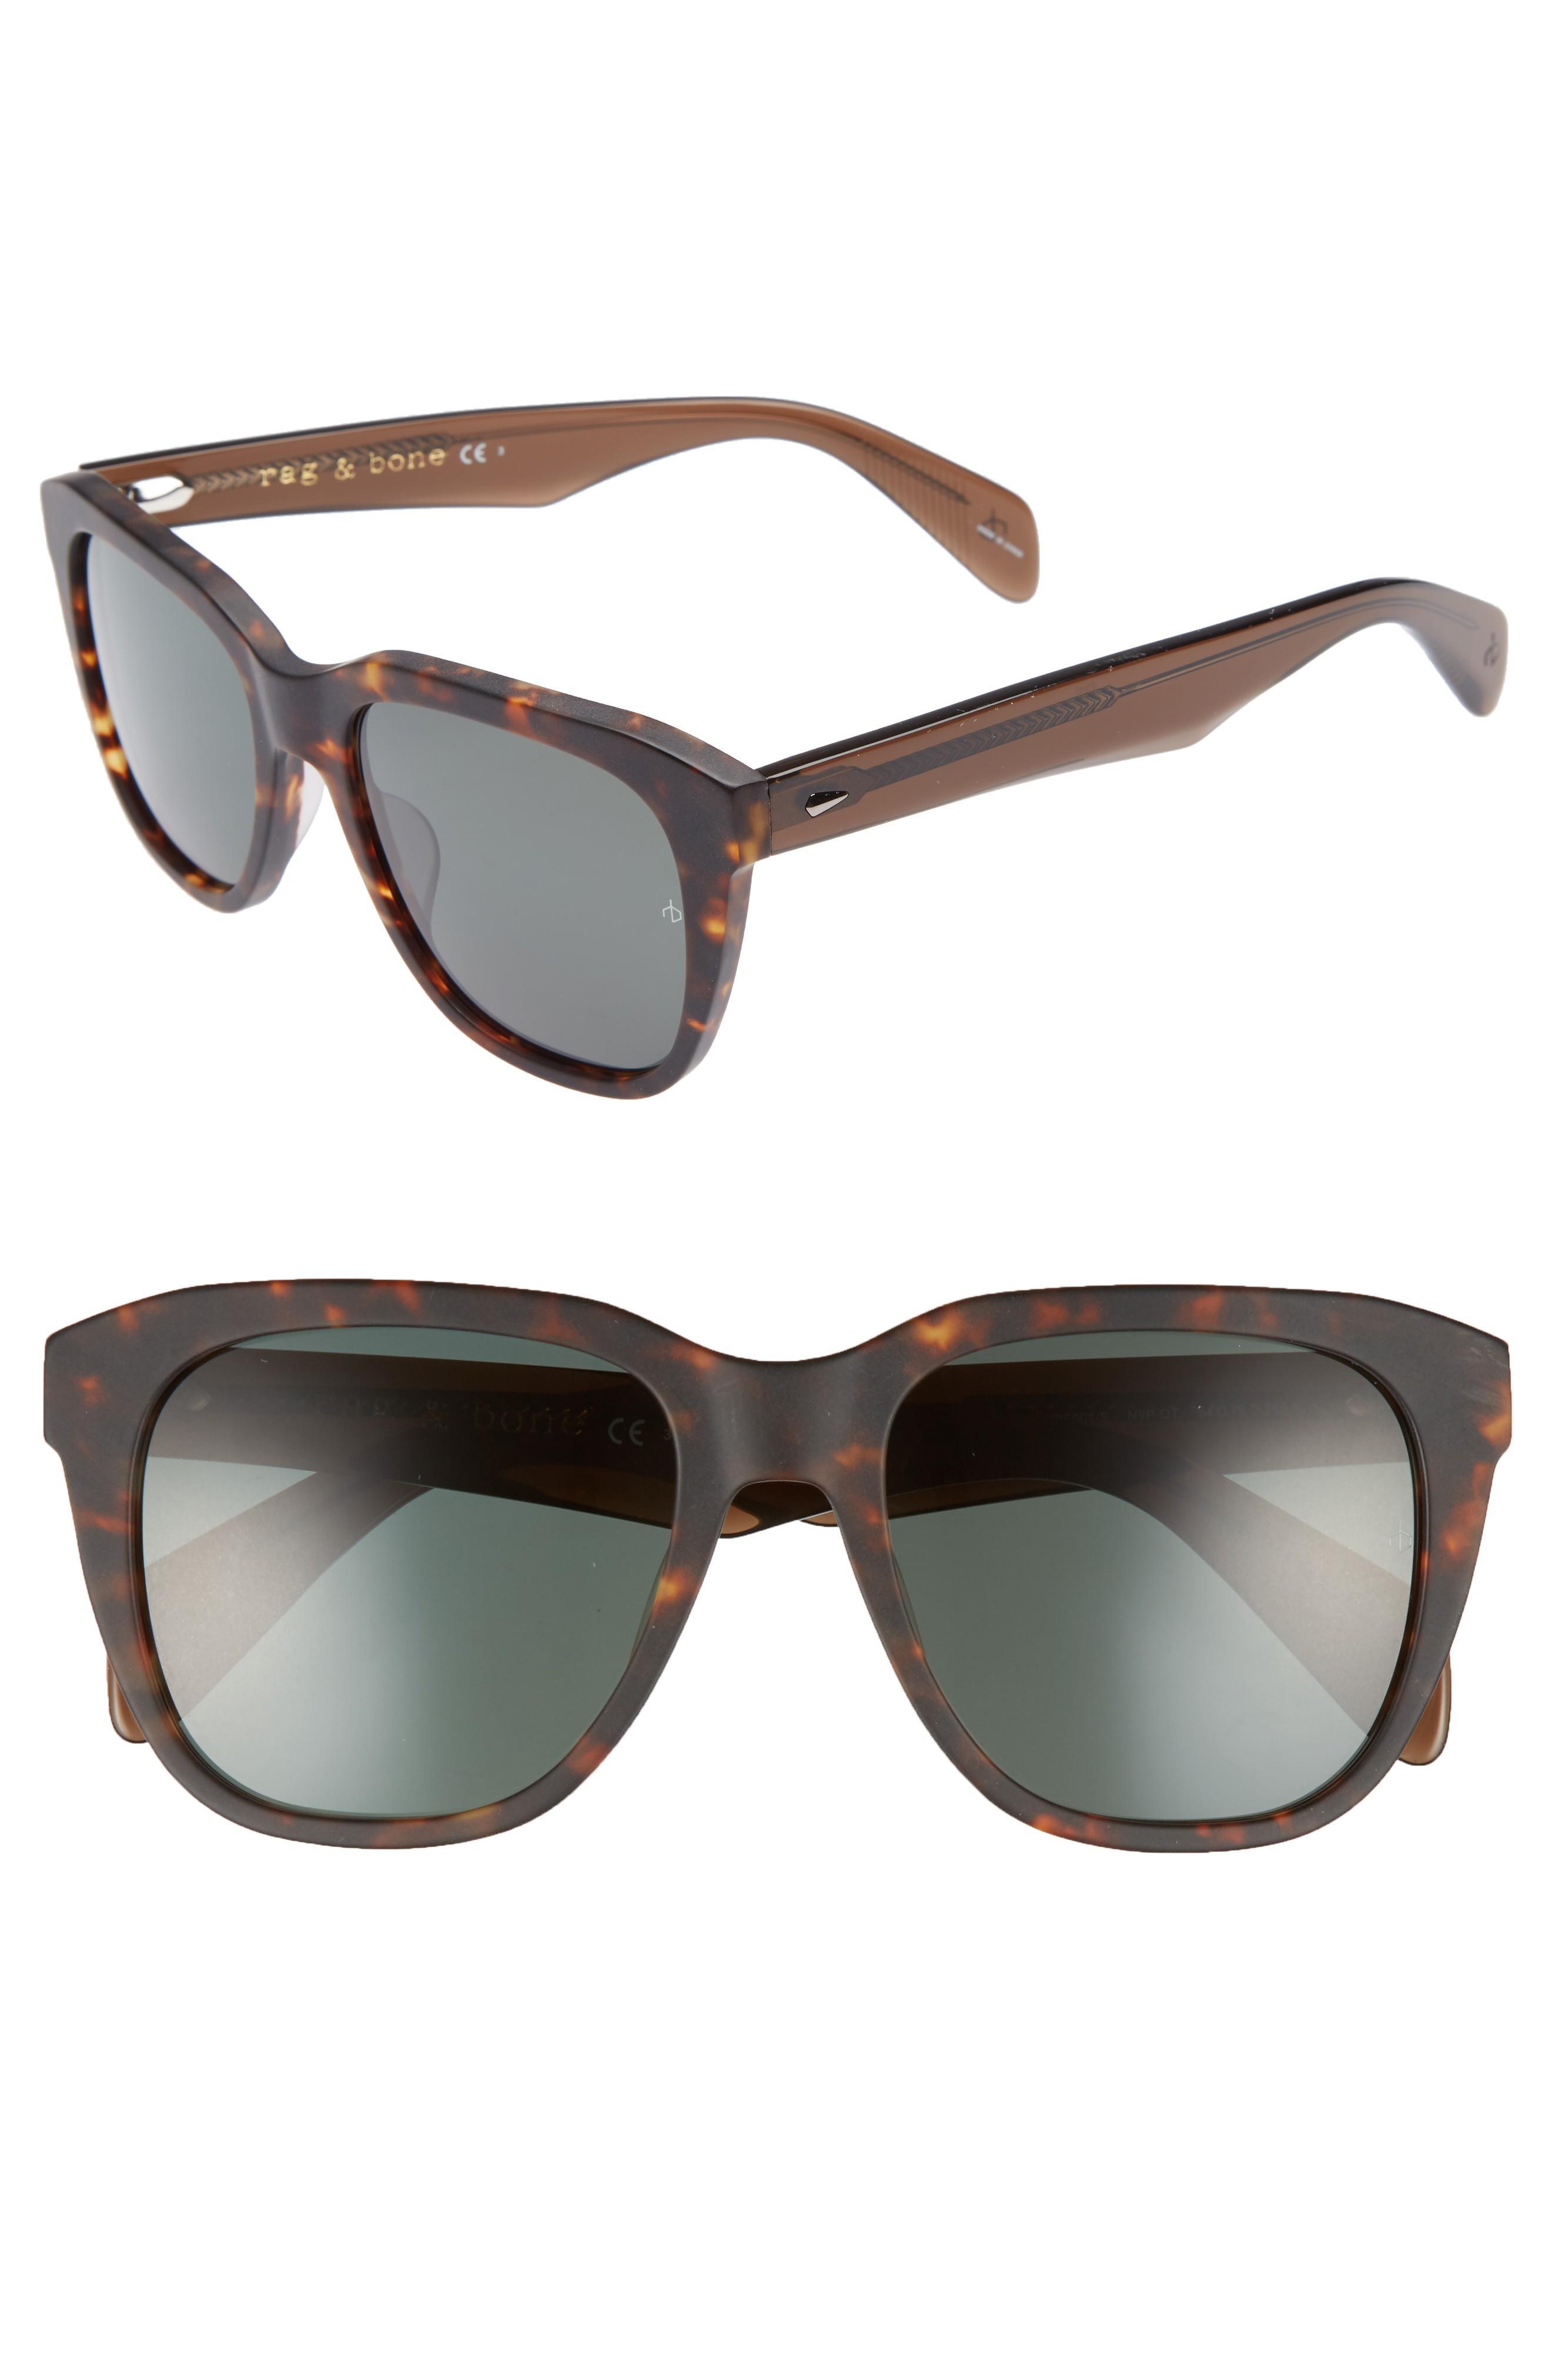 e2d1788fed51 Rag   Bone 54Mm Sunglasses - Matte Havana